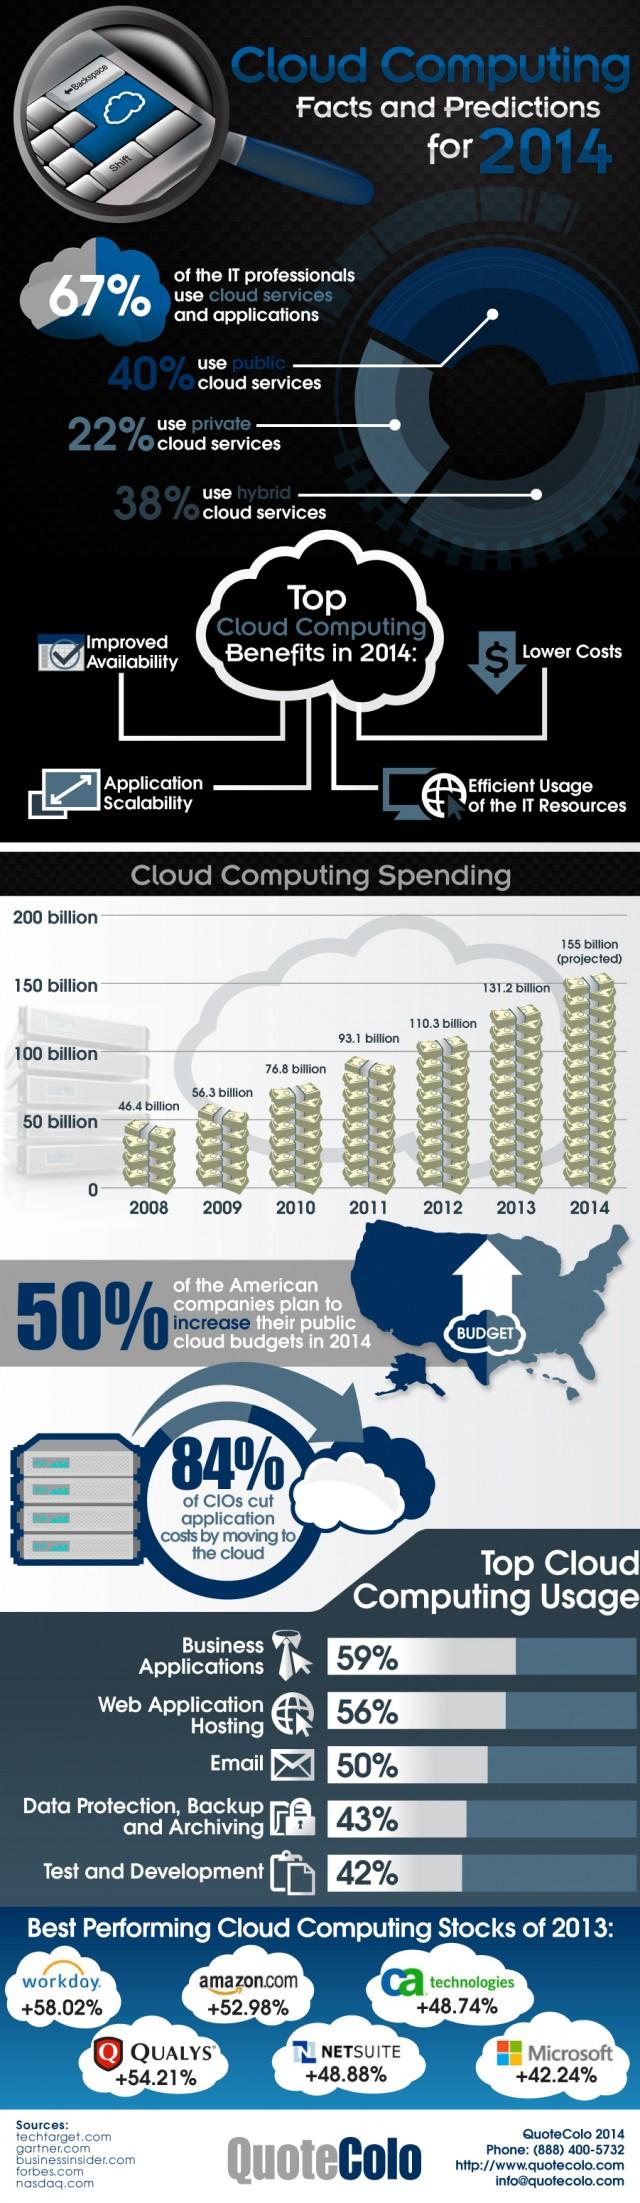 cloud-computing-2014